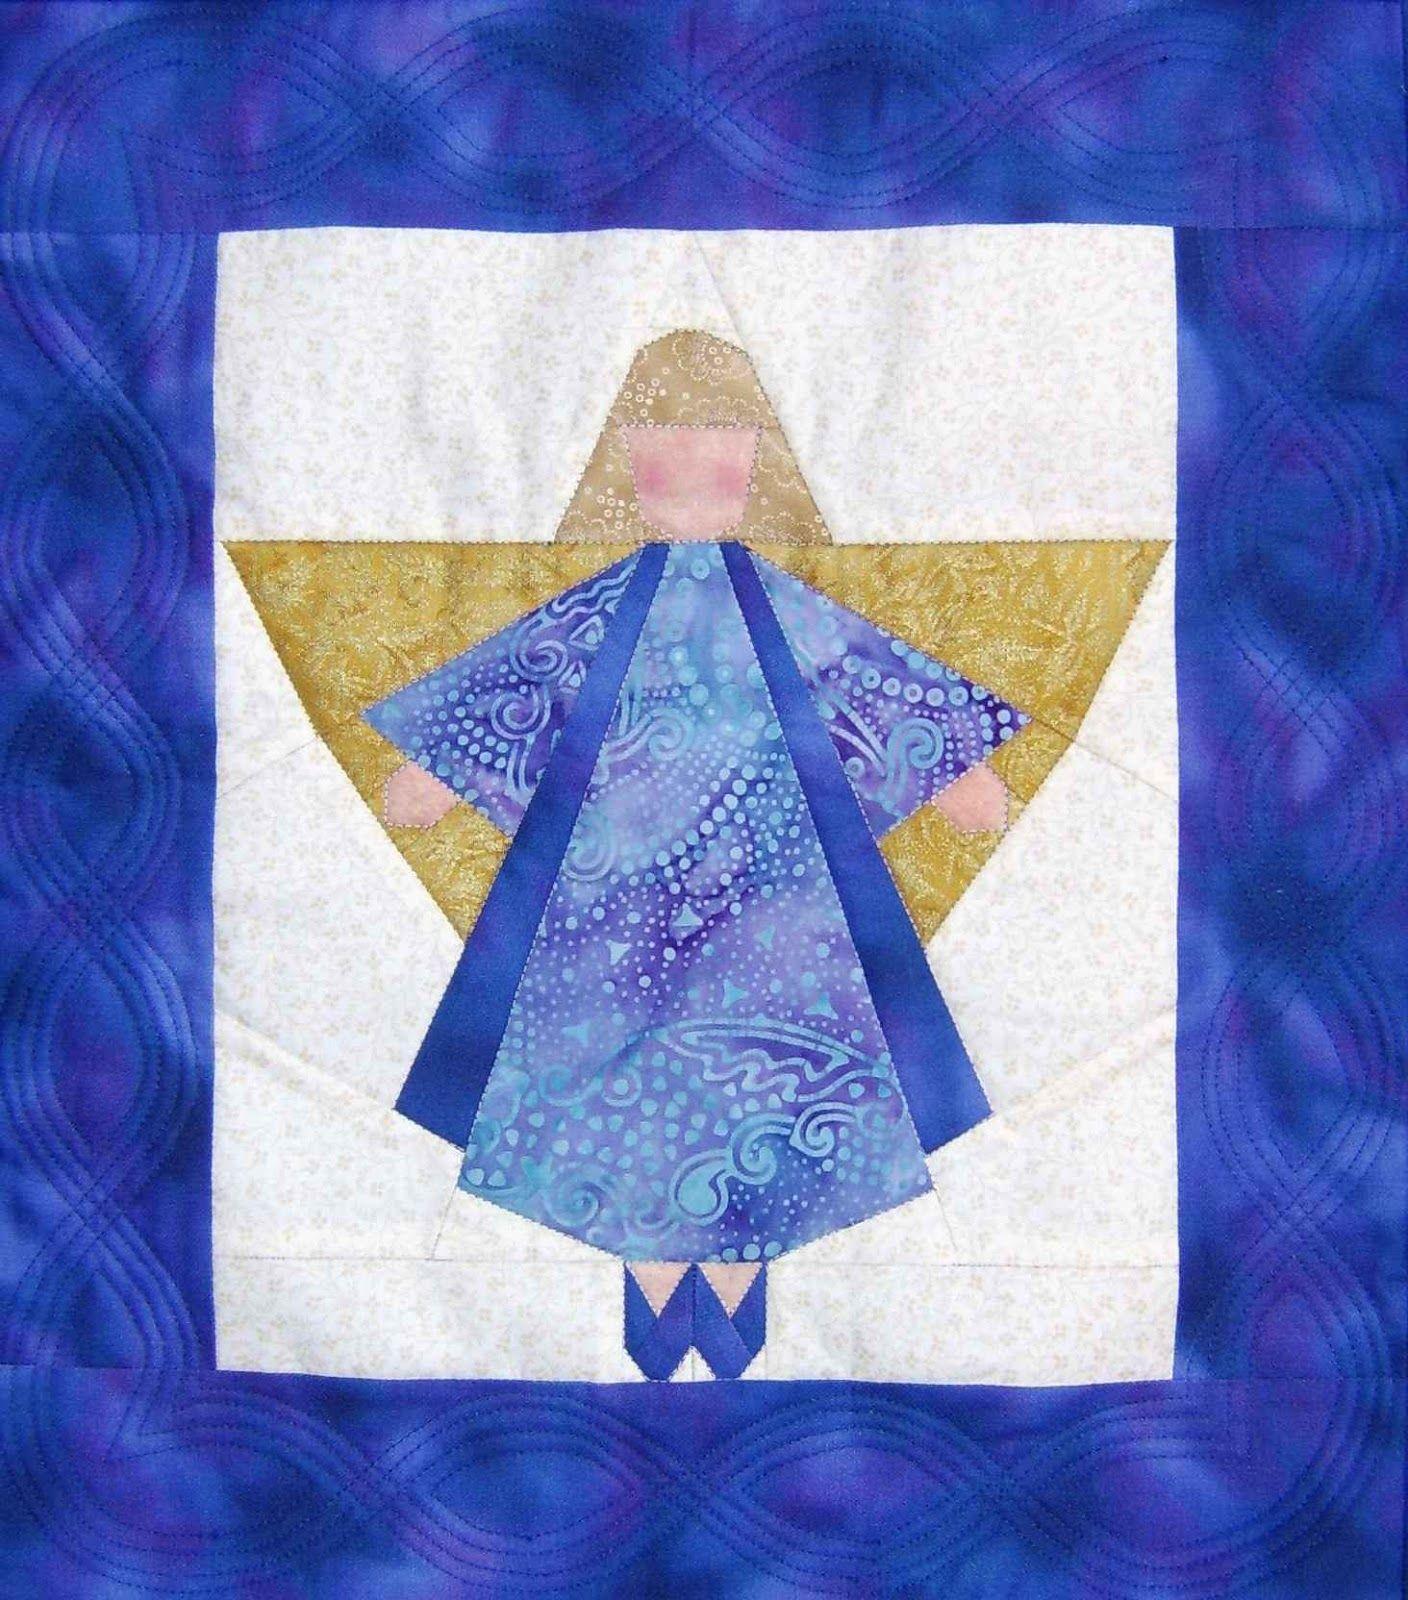 Paper Pieced Quilt Patterns Christmas: Paper Piecing Patterns, Quilt